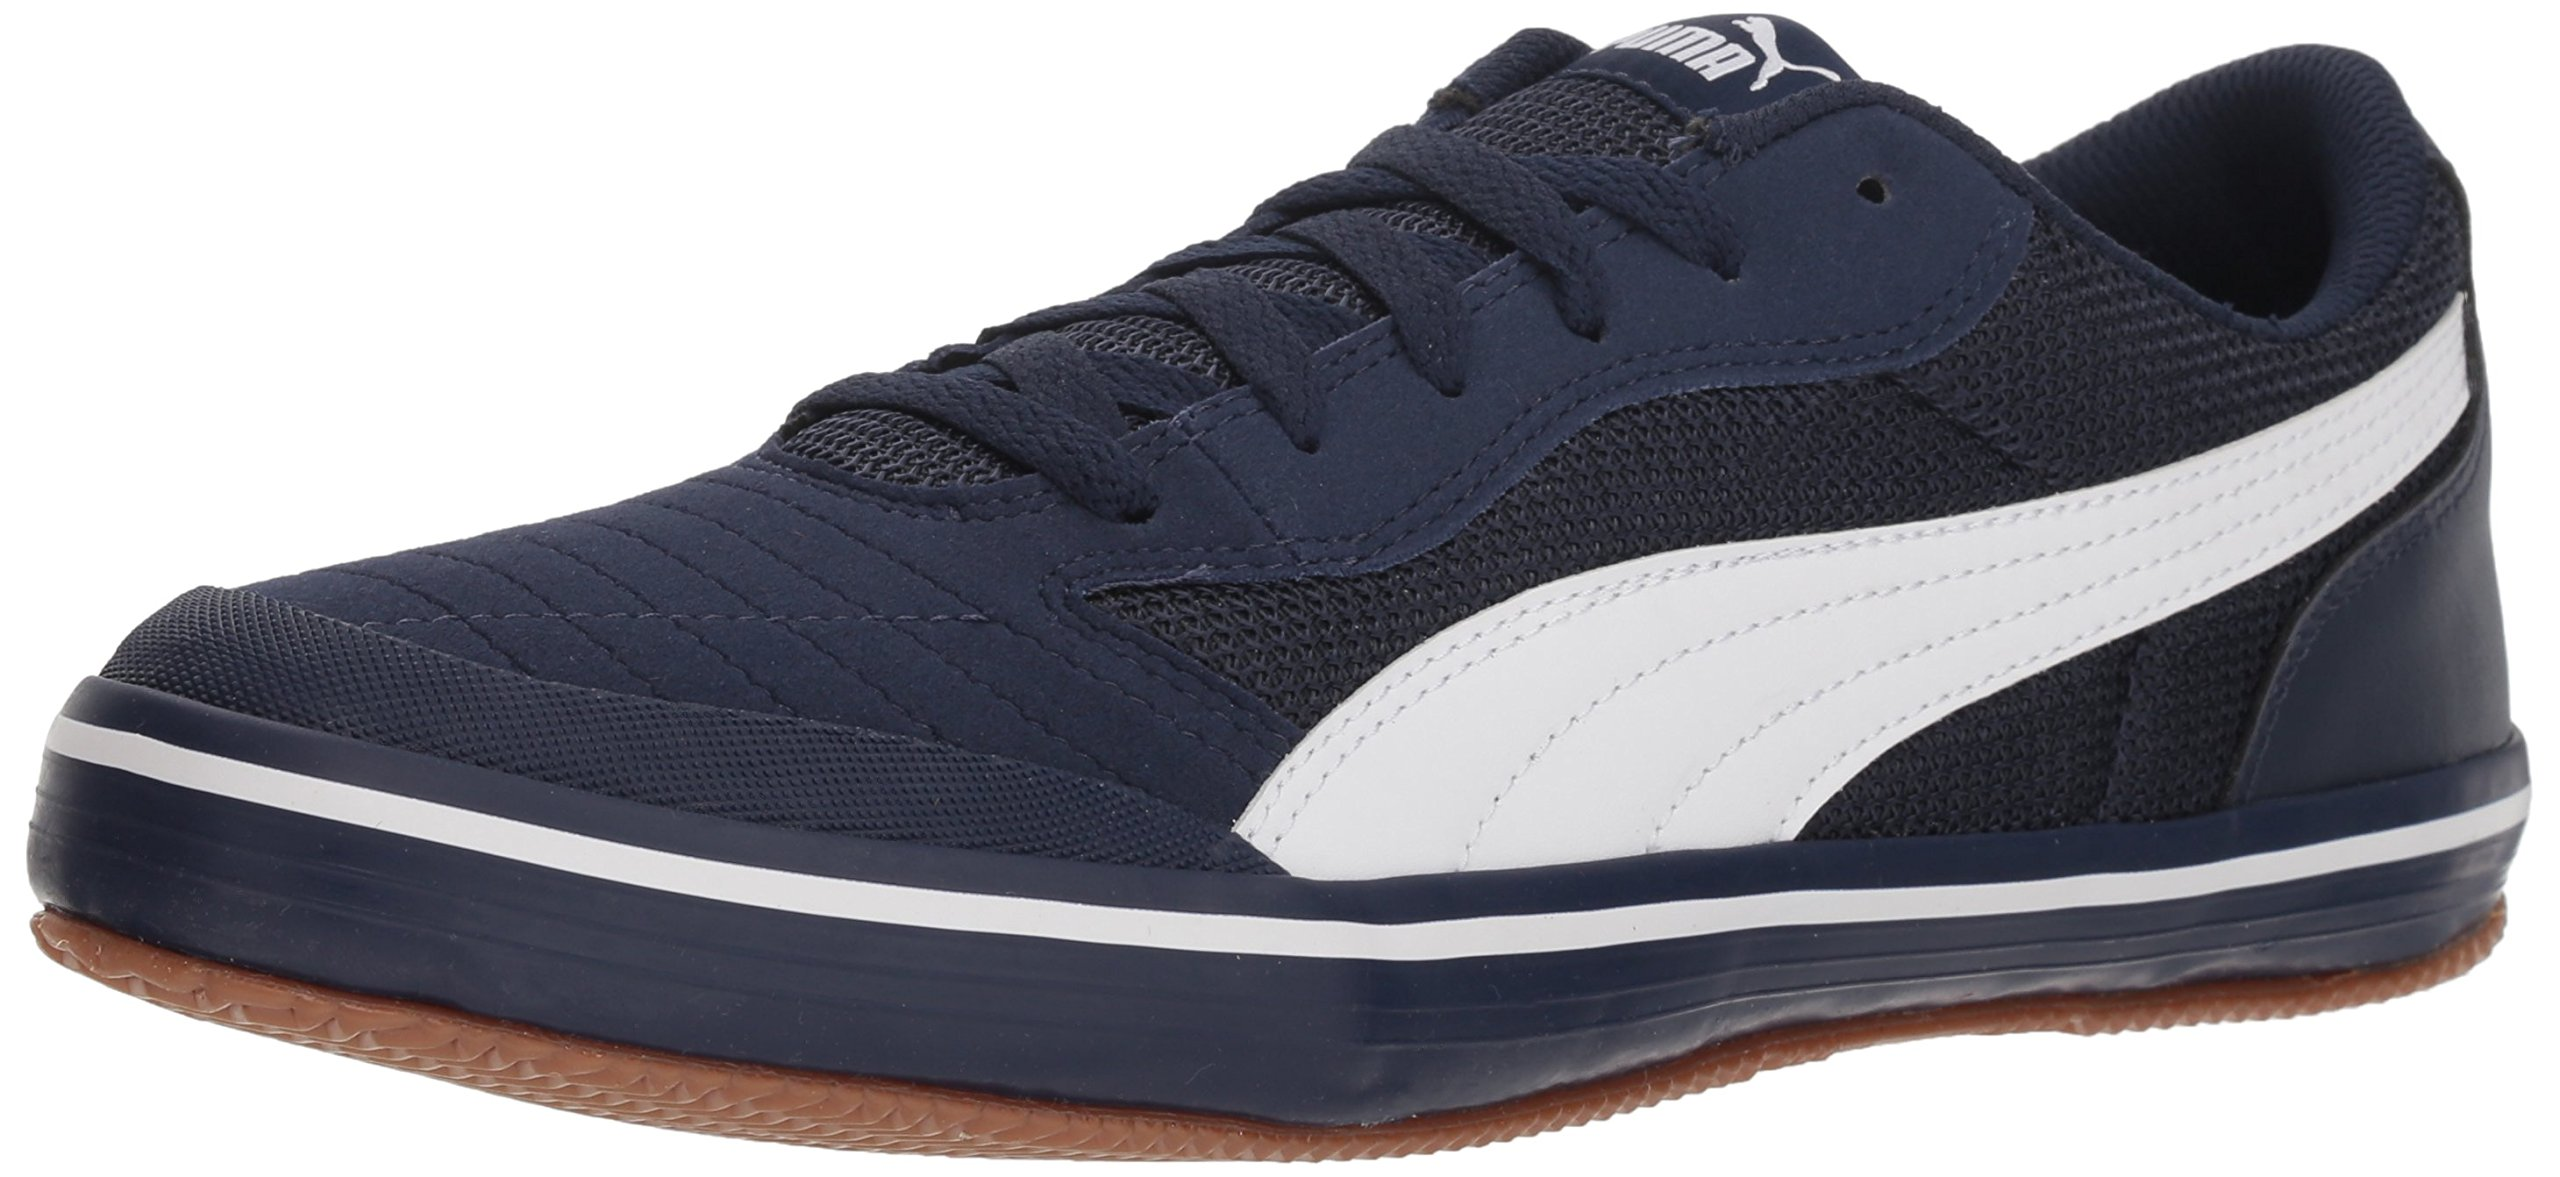 PUMA Men's Astro Sala Sneaker, Peacoat White, 11.5 M US